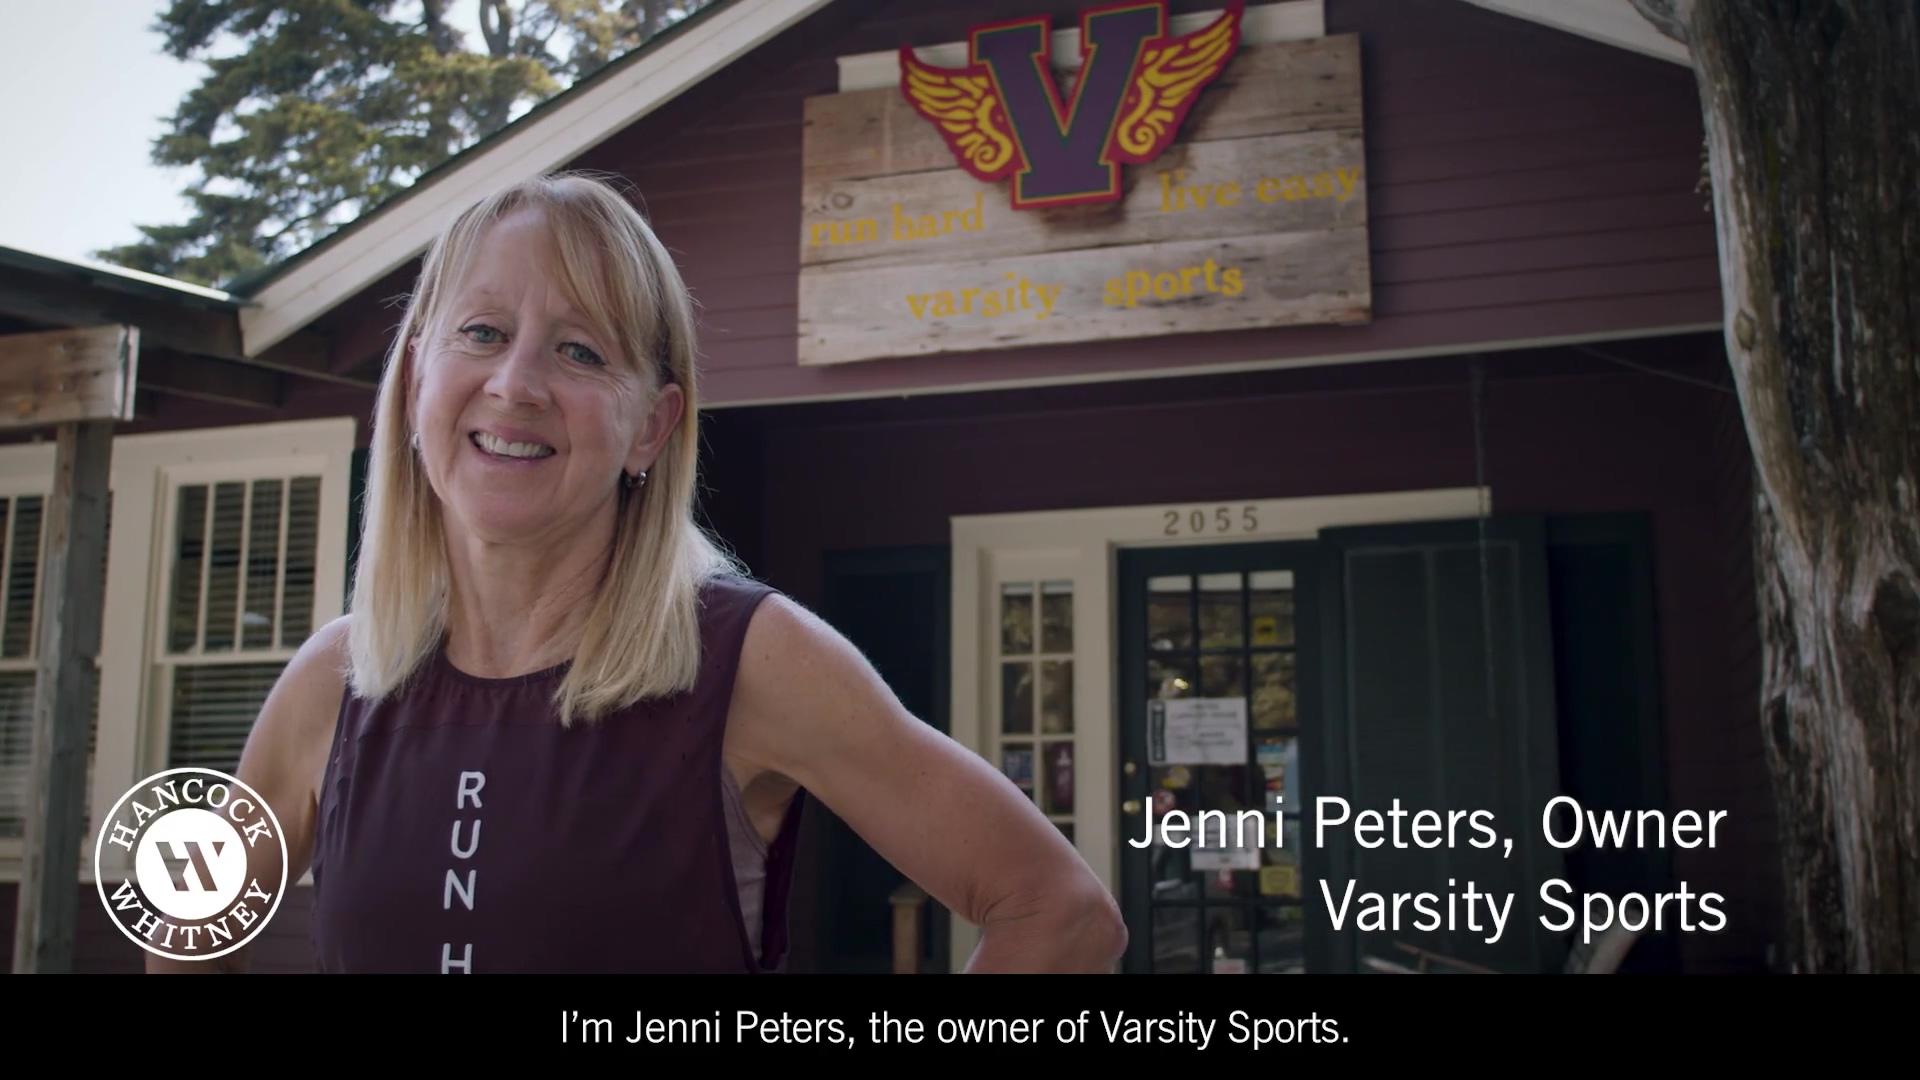 PPP-Varsity-Sports-Subtitles-MP4 - HS Test